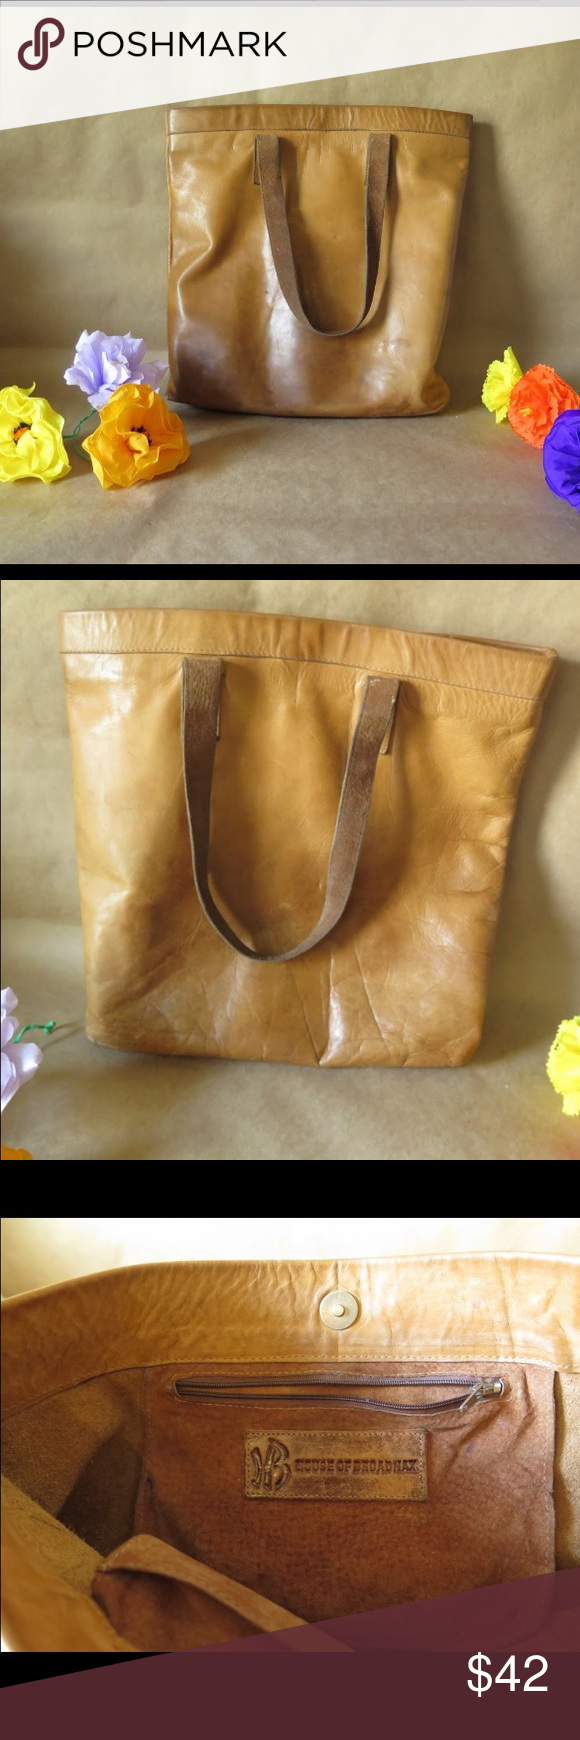 Tan Leather Shoulder Bag Beautiful glowing buttery distressed leather bag Bags Shoulder Bags